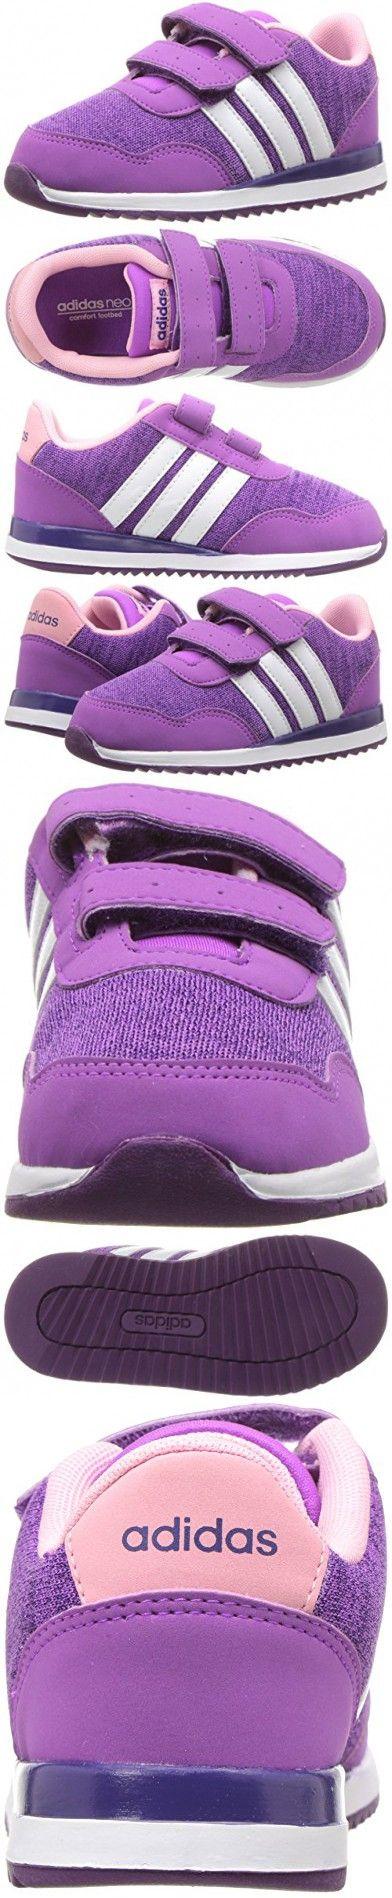 Adidas NEO Girls' V Jog Cmf Inf Sneaker, Shock Purple/White/Tribe Purple White, 6 M US Infant